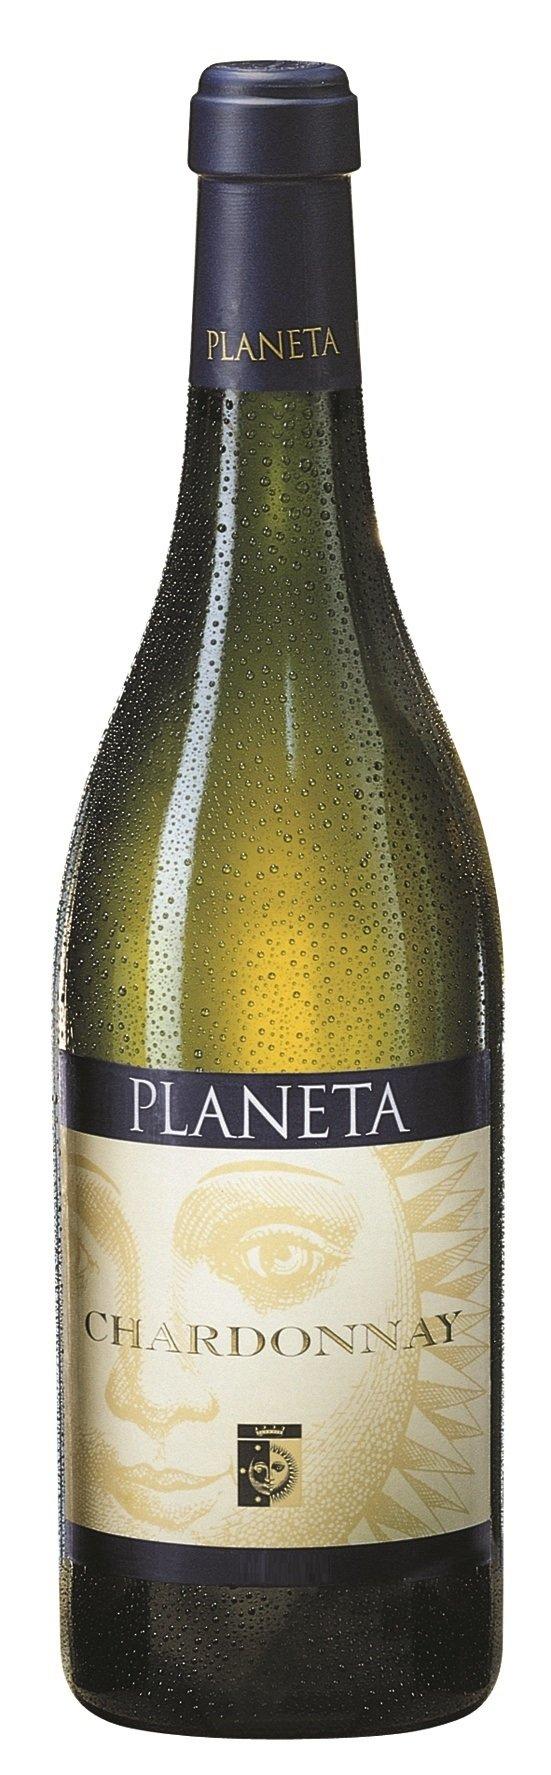 6x-075l-2017er-Planeta-Chardonnay-Sicilia-IGT-Sizilien-Italien-Weiwein-trocken